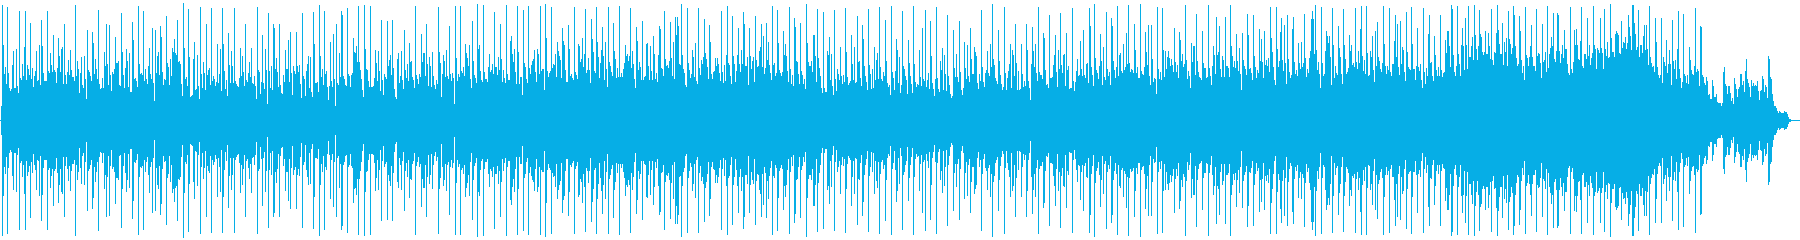 Energy Grooveと優れた...の再生済みの波形